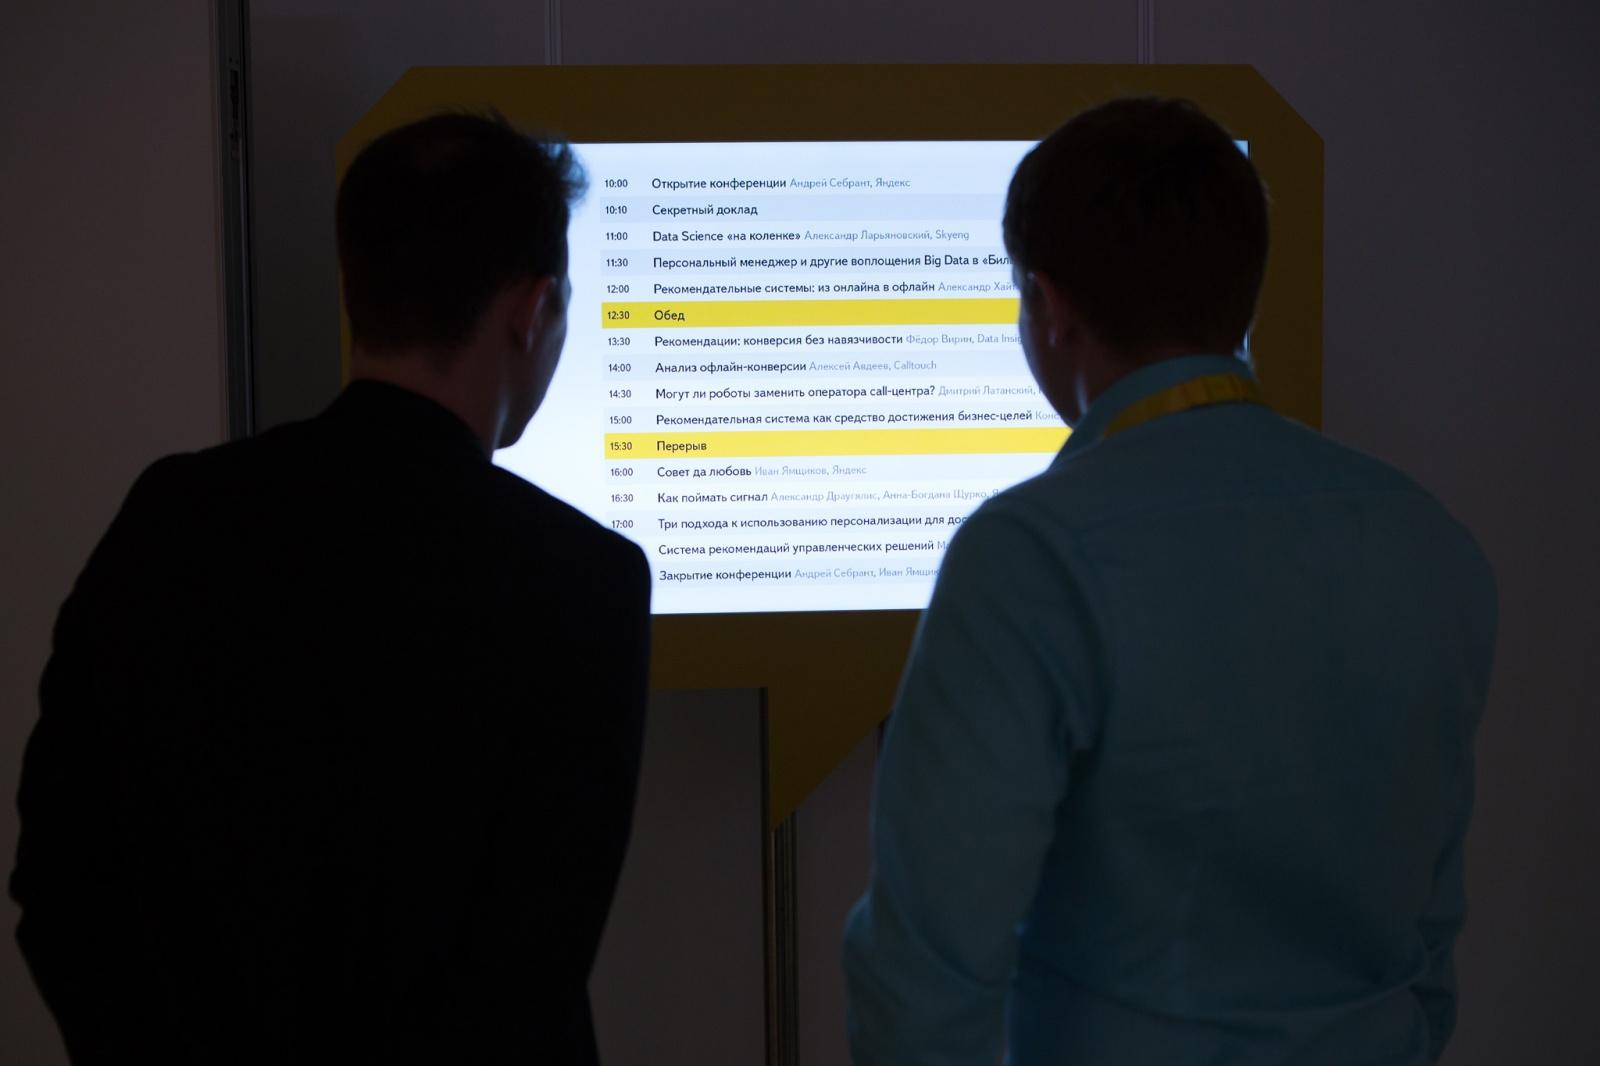 Продакт и проджект — в чём разница? Мнения руководителей сервисов Яндекса - 1